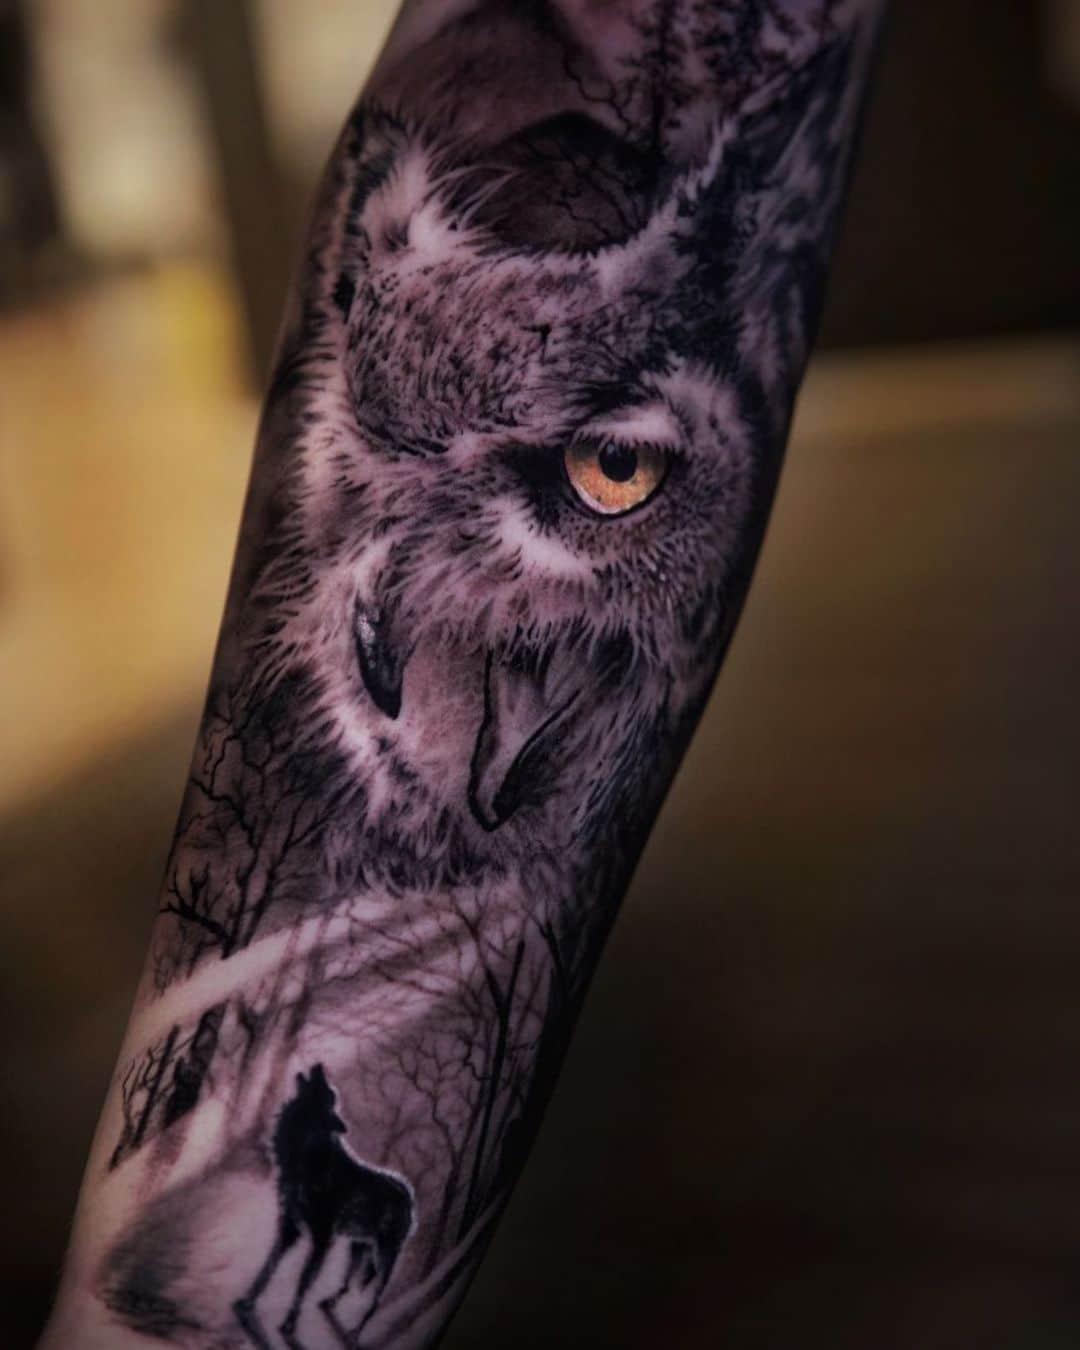 rafael-perez-owl-tattoo-hyper-realistic-color-tattoo